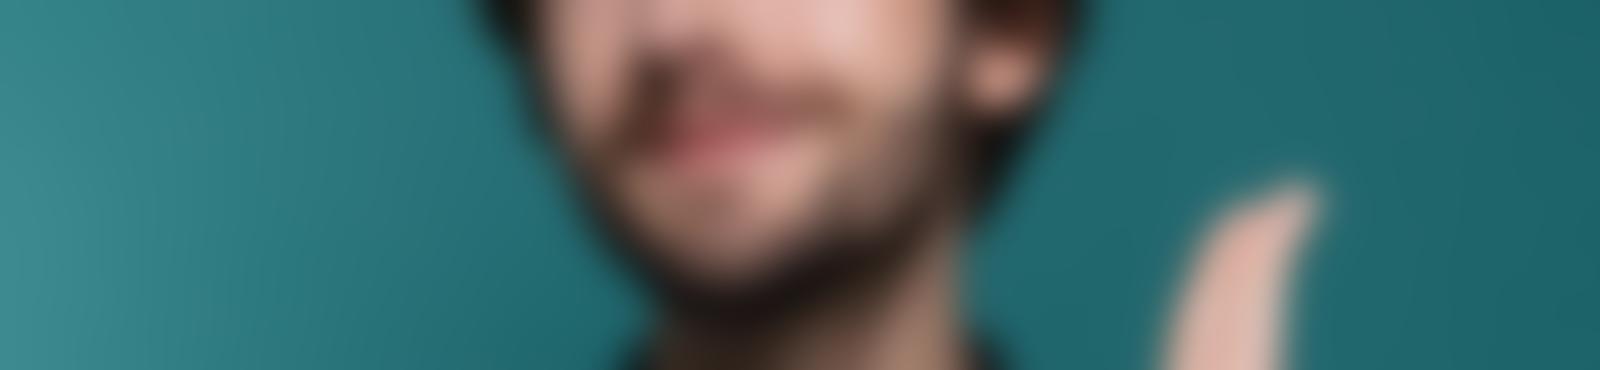 Blurred bb822ea9 986f 44a5 9374 d910980ae31f